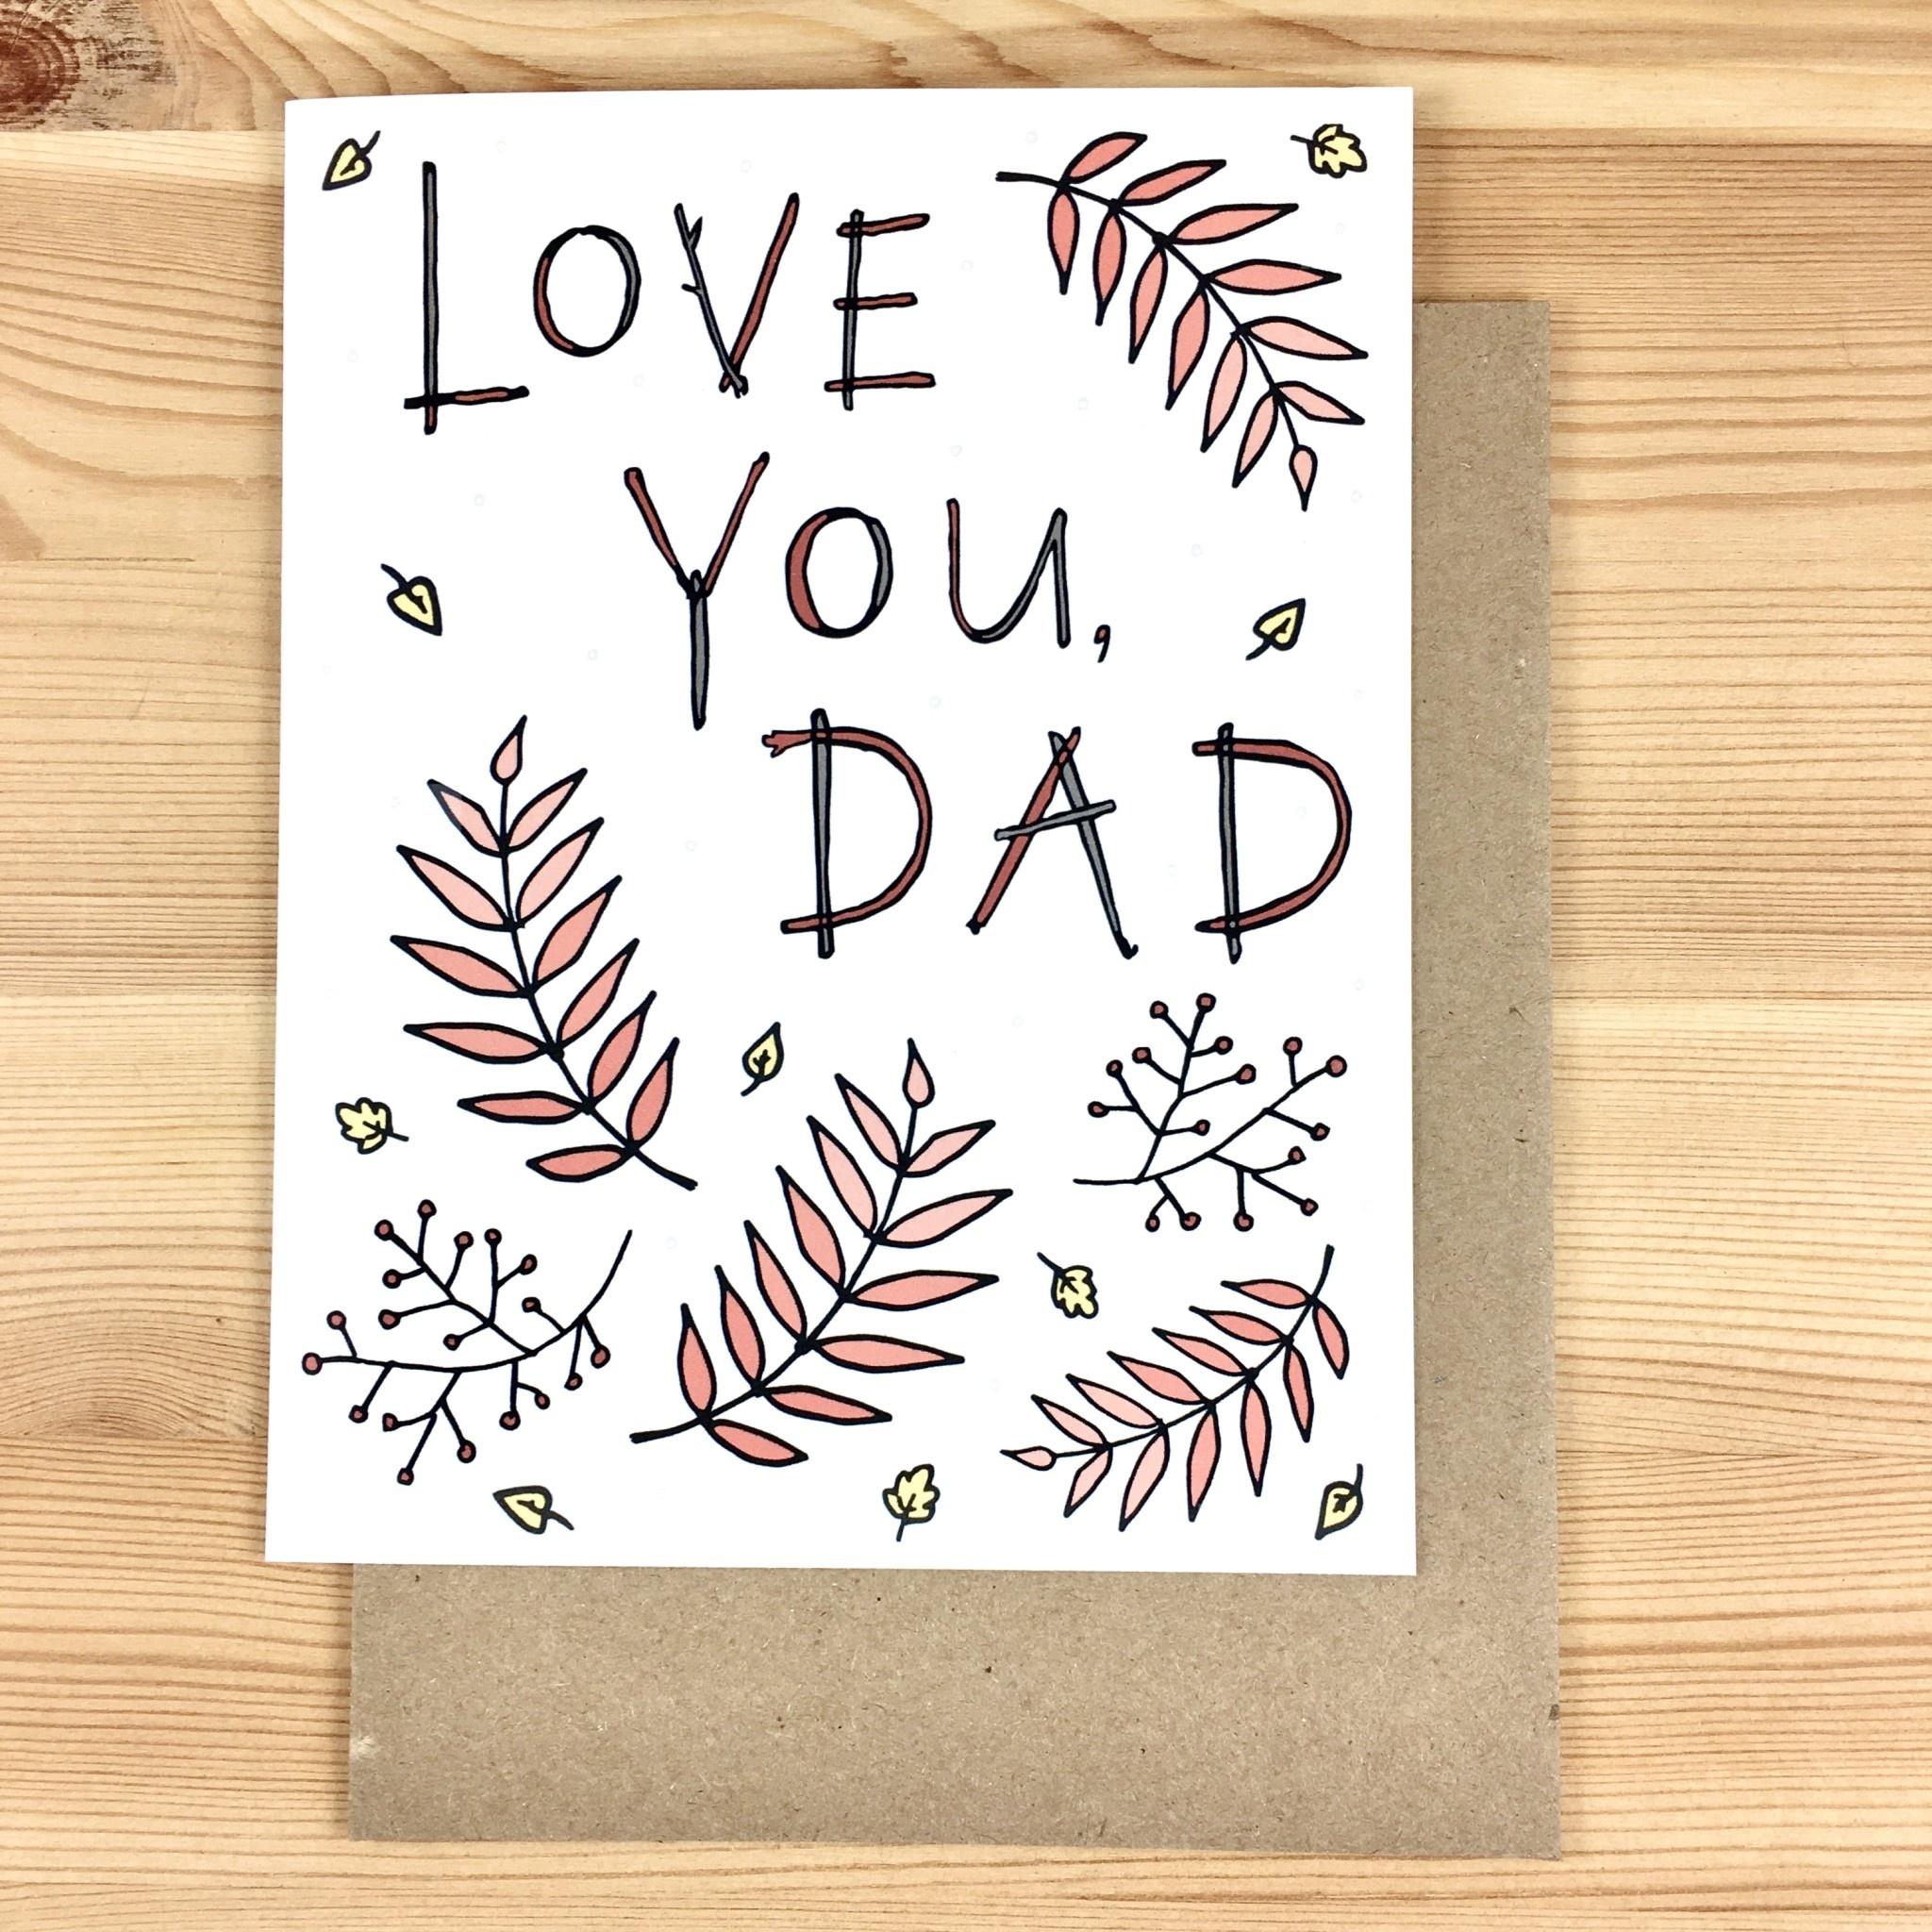 Lacelit Love You, Dad Ferns Greeting Card